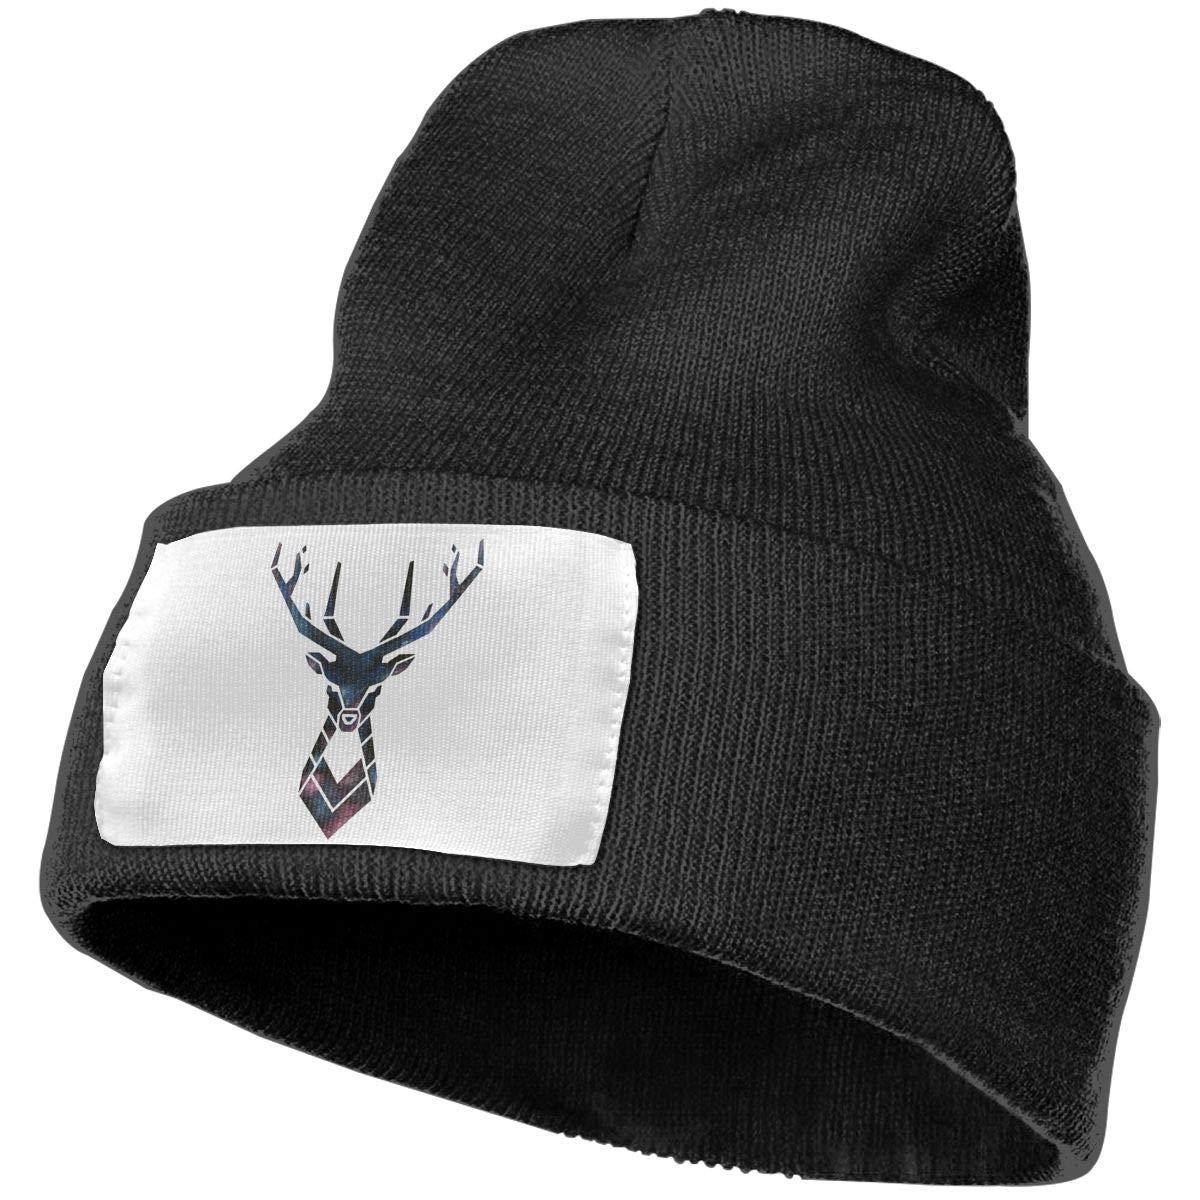 Yubb7E Deer Galaxy Warm Knit Winter Solid Beanie Hat Unisex Skull Cap